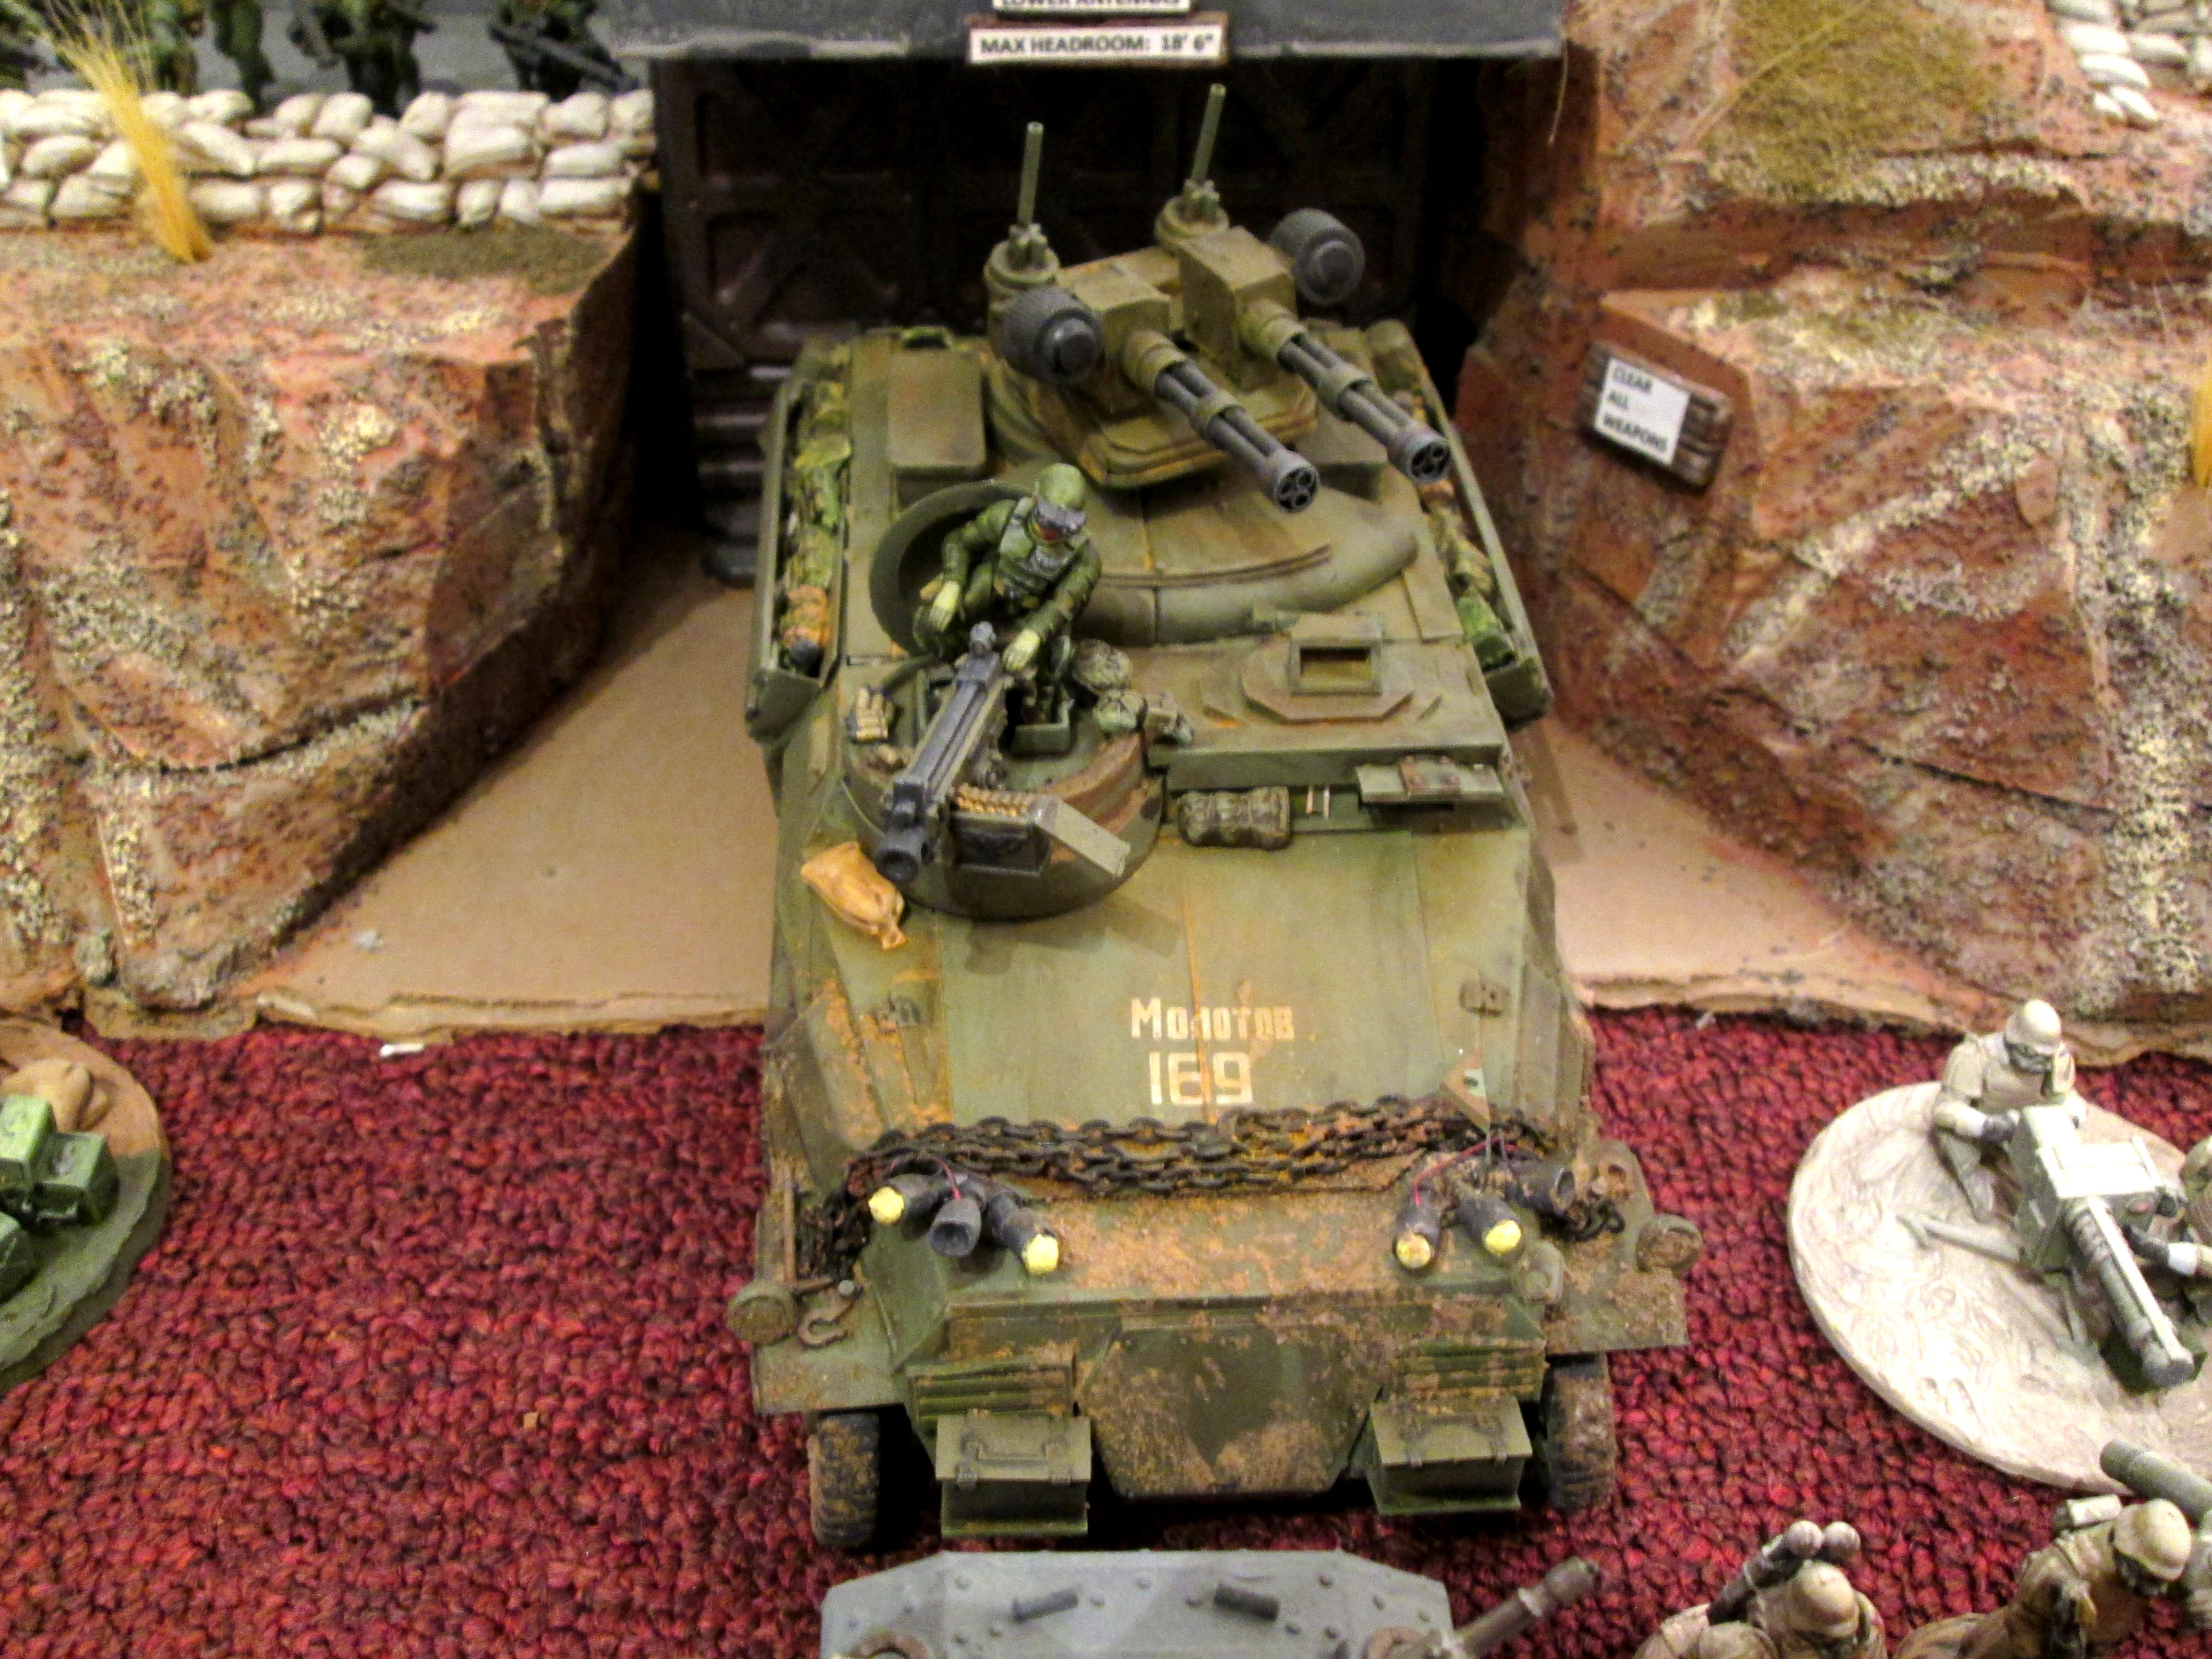 Armor, Army, Artillery, Firebase, Imperial Guard, Infantry